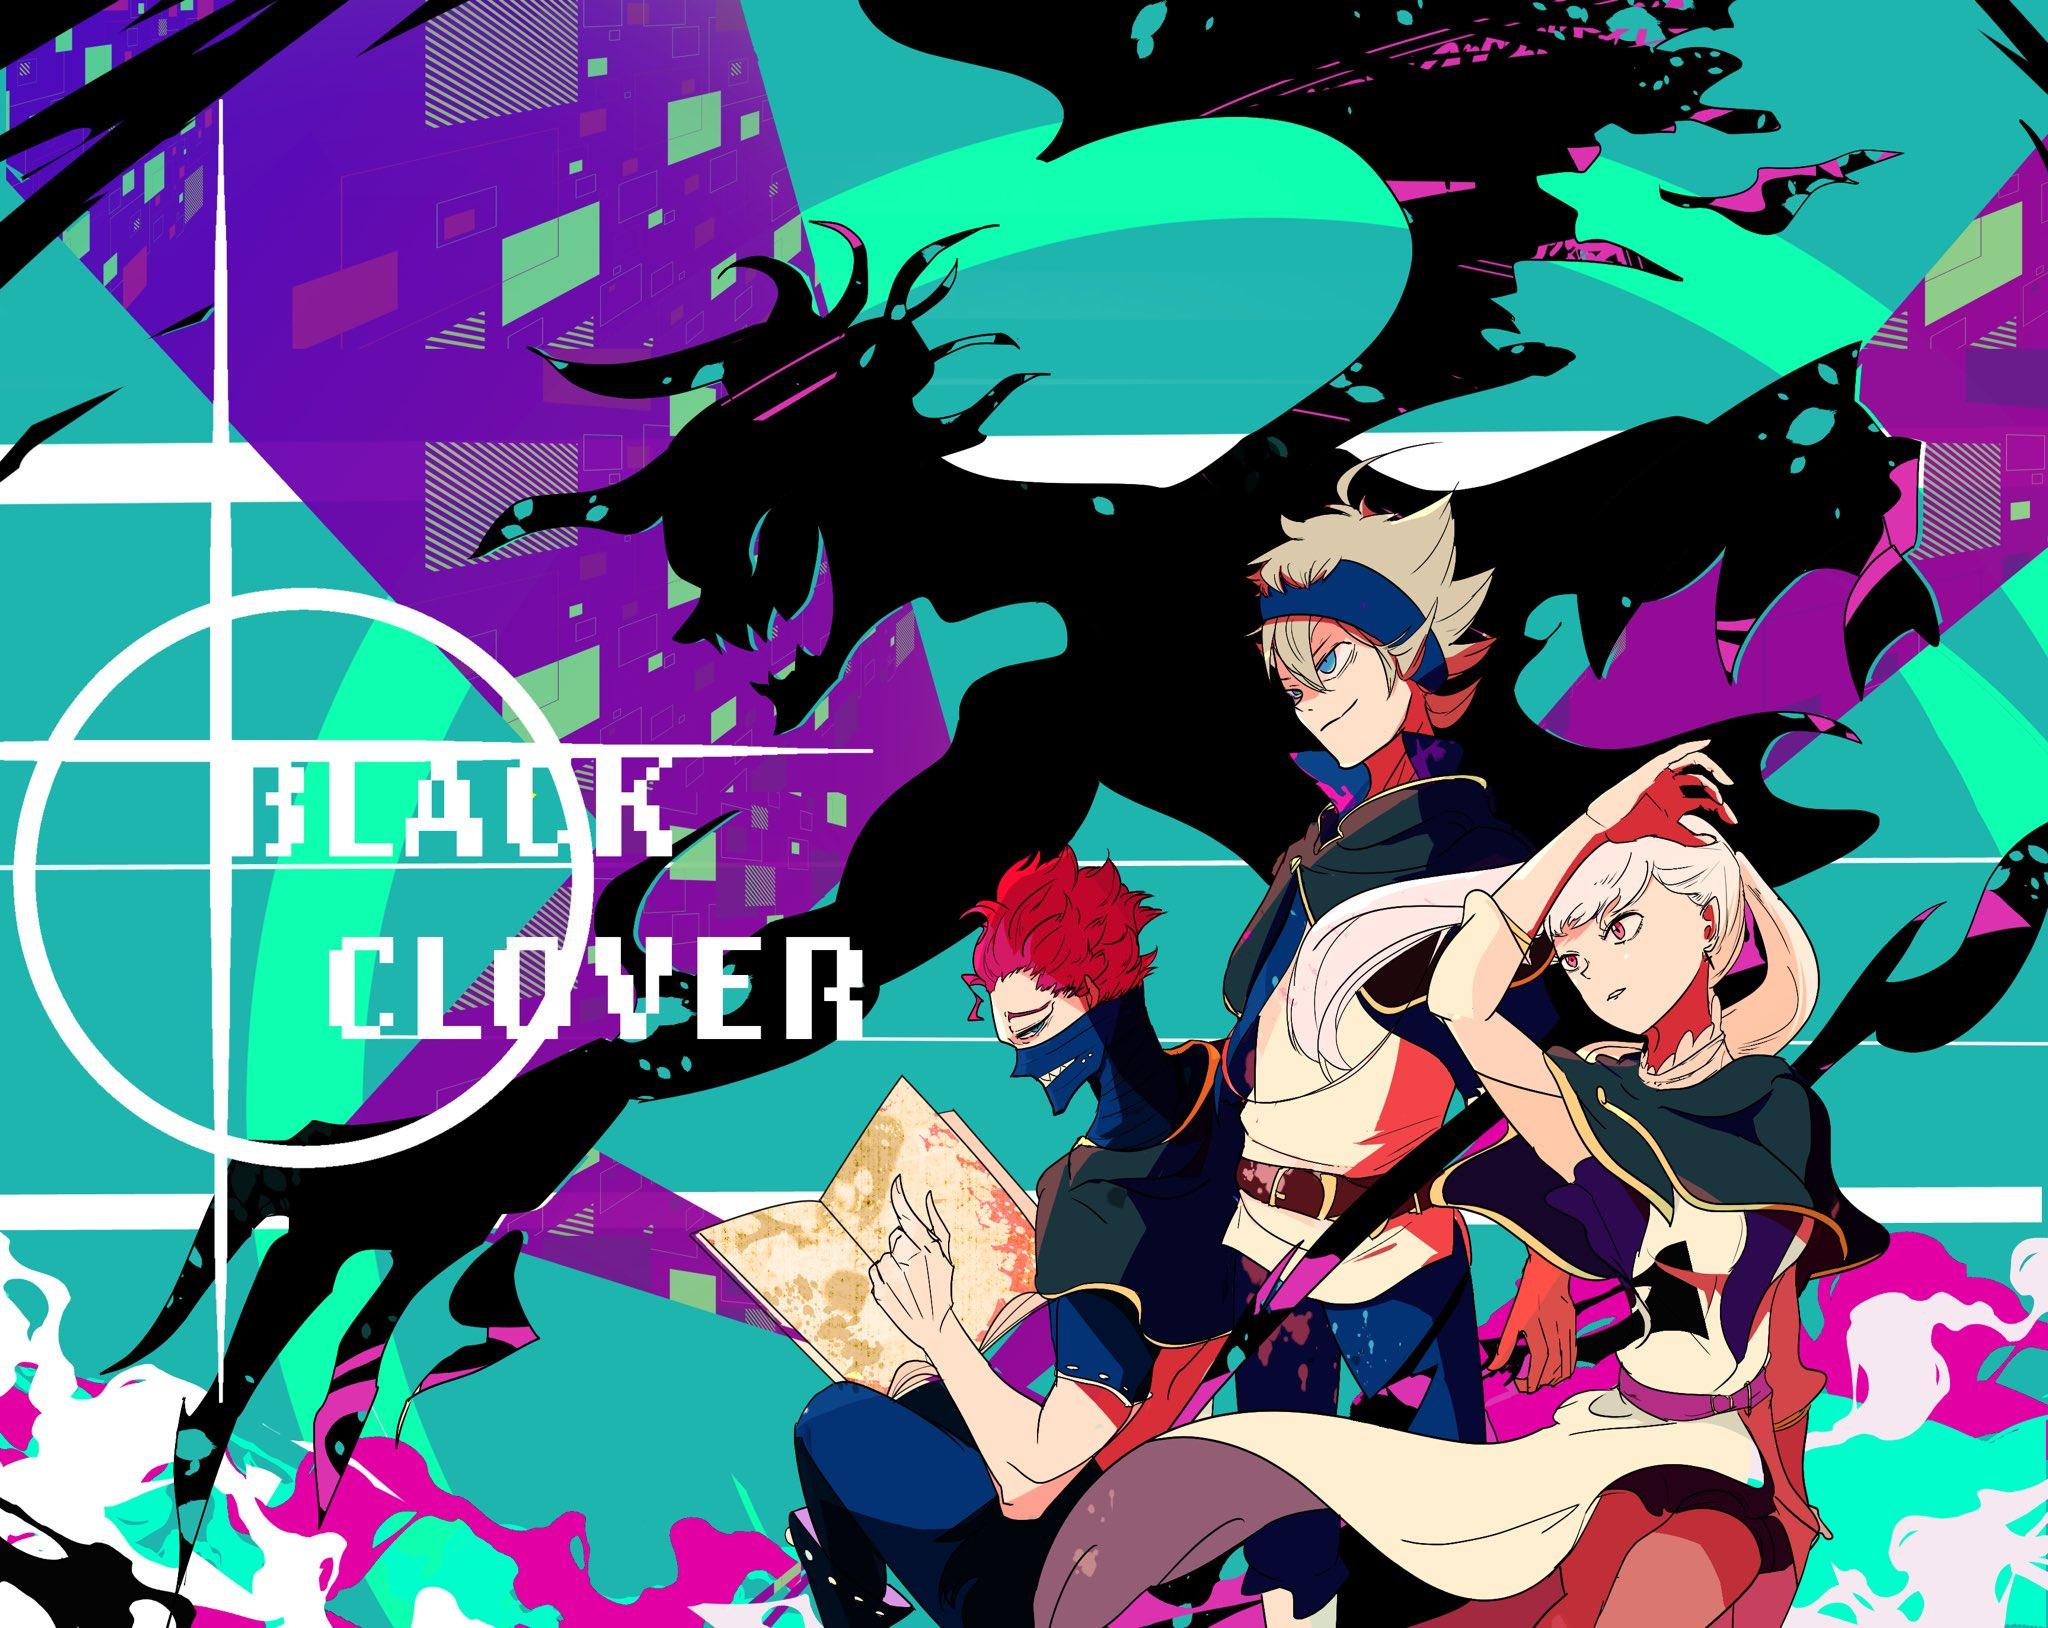 Black Clover Wallpaper Black Clover Wallpaper New 3217330 Hd Wallpaper Backgrounds Download